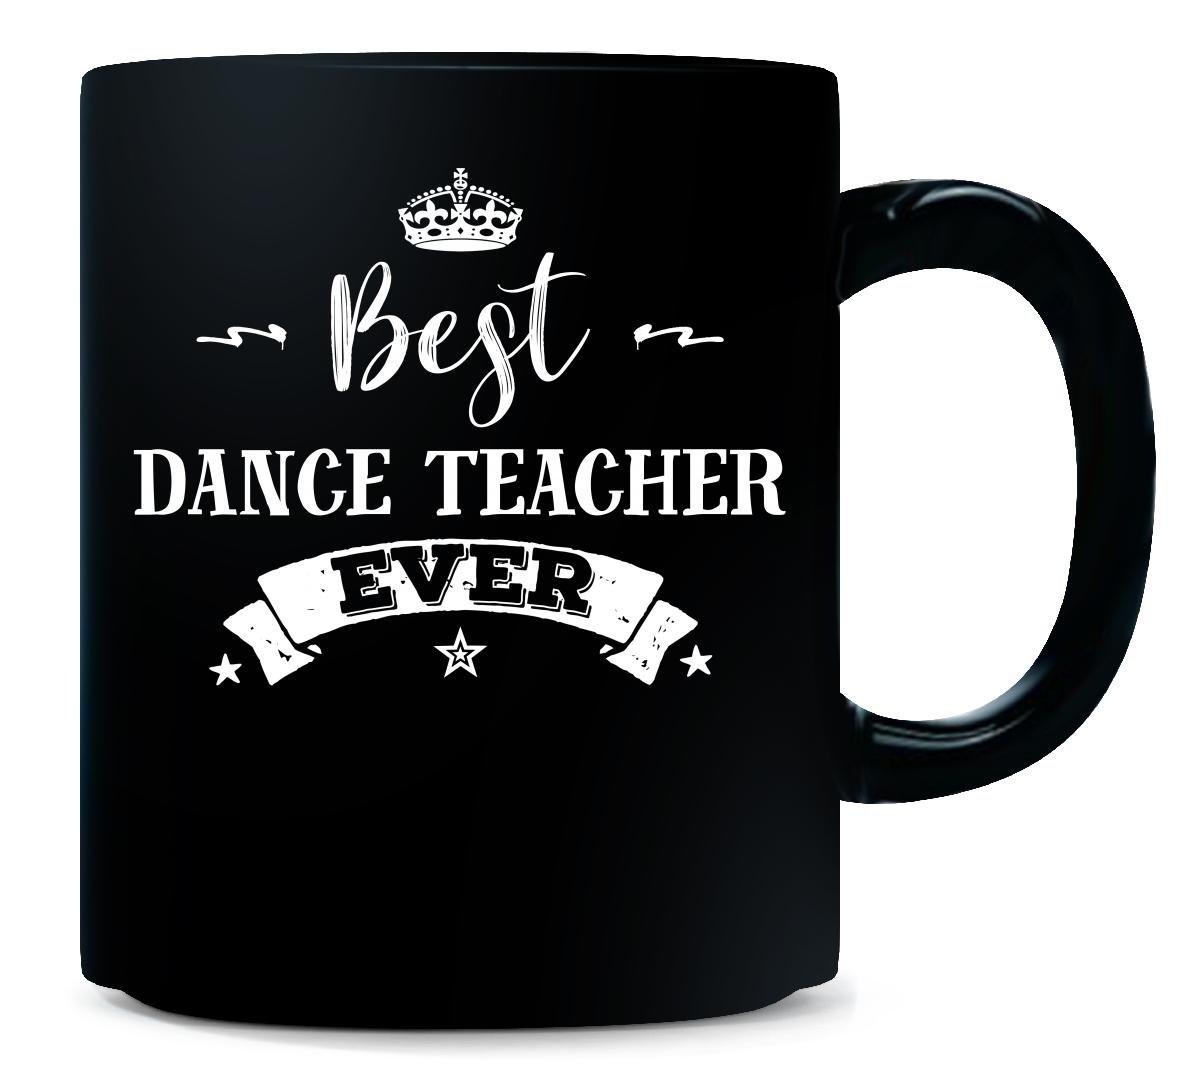 Best Dance Teacher Ever Cool Gift - Mug